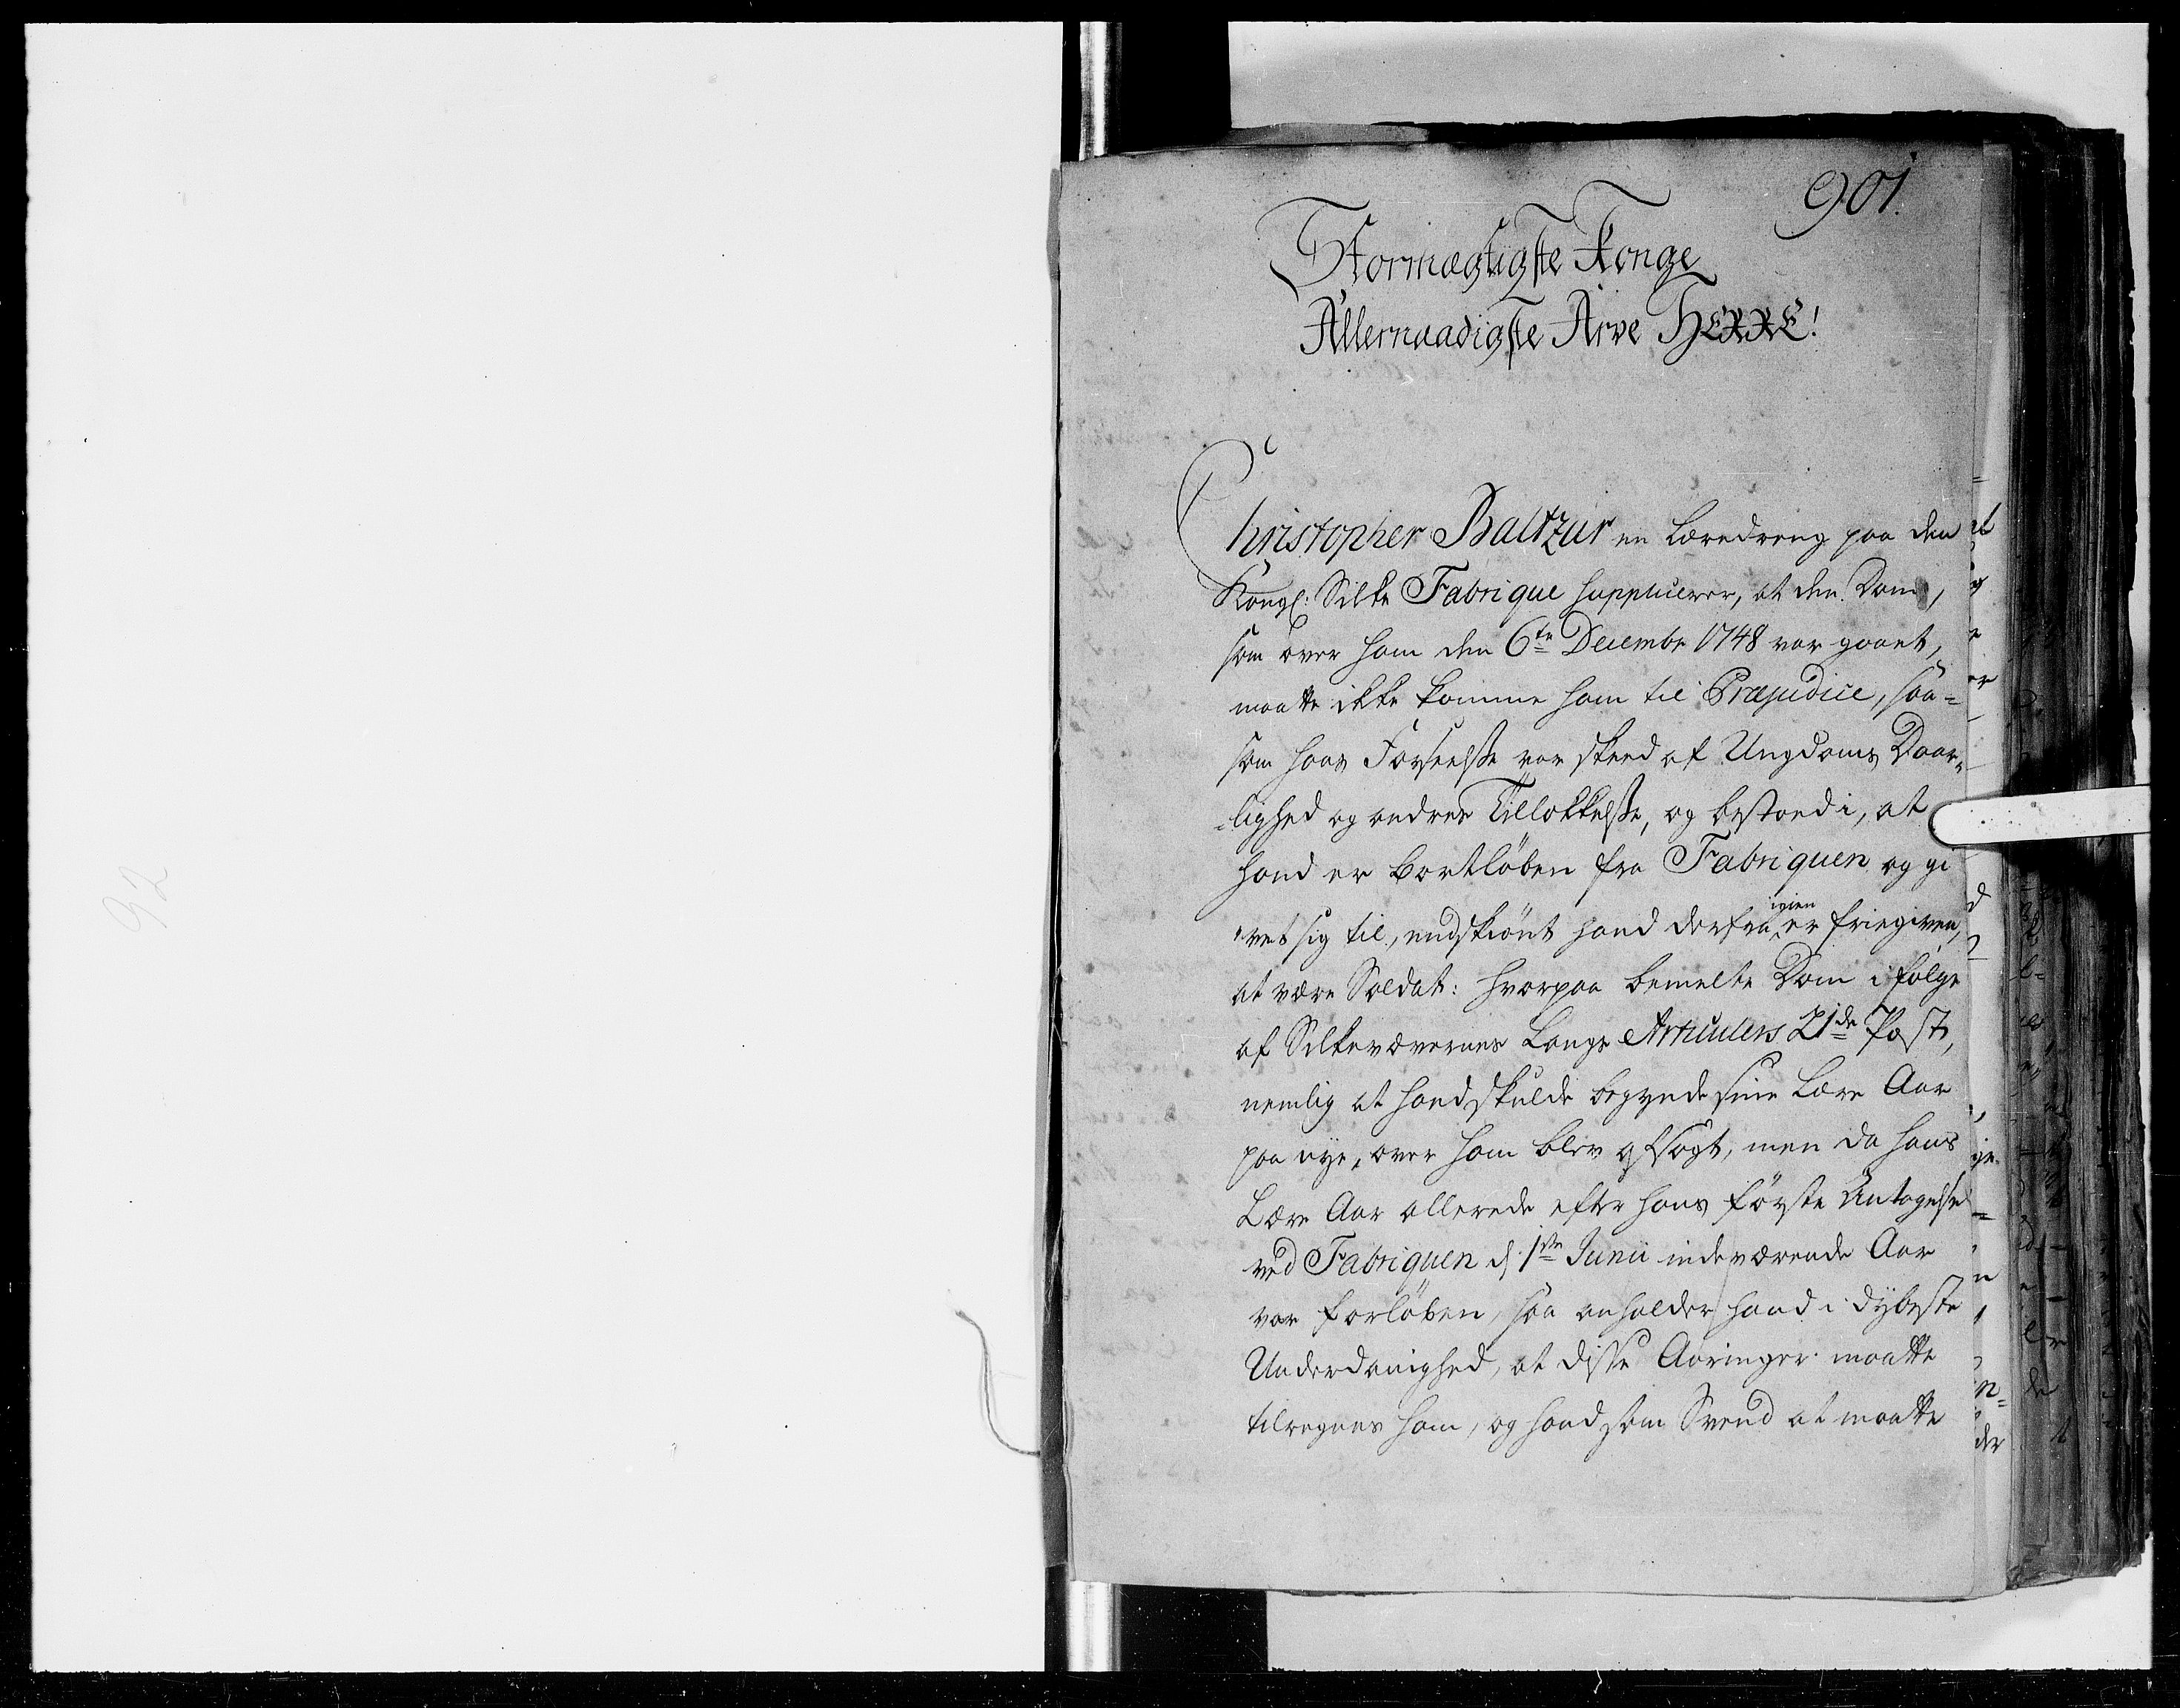 DRA, Kommercekollegiet, Dansk-Norske Sekretariat (1736-1771) / Kommercedeputationen (1771-1773), -/008: Forestillinger, 1750-1753